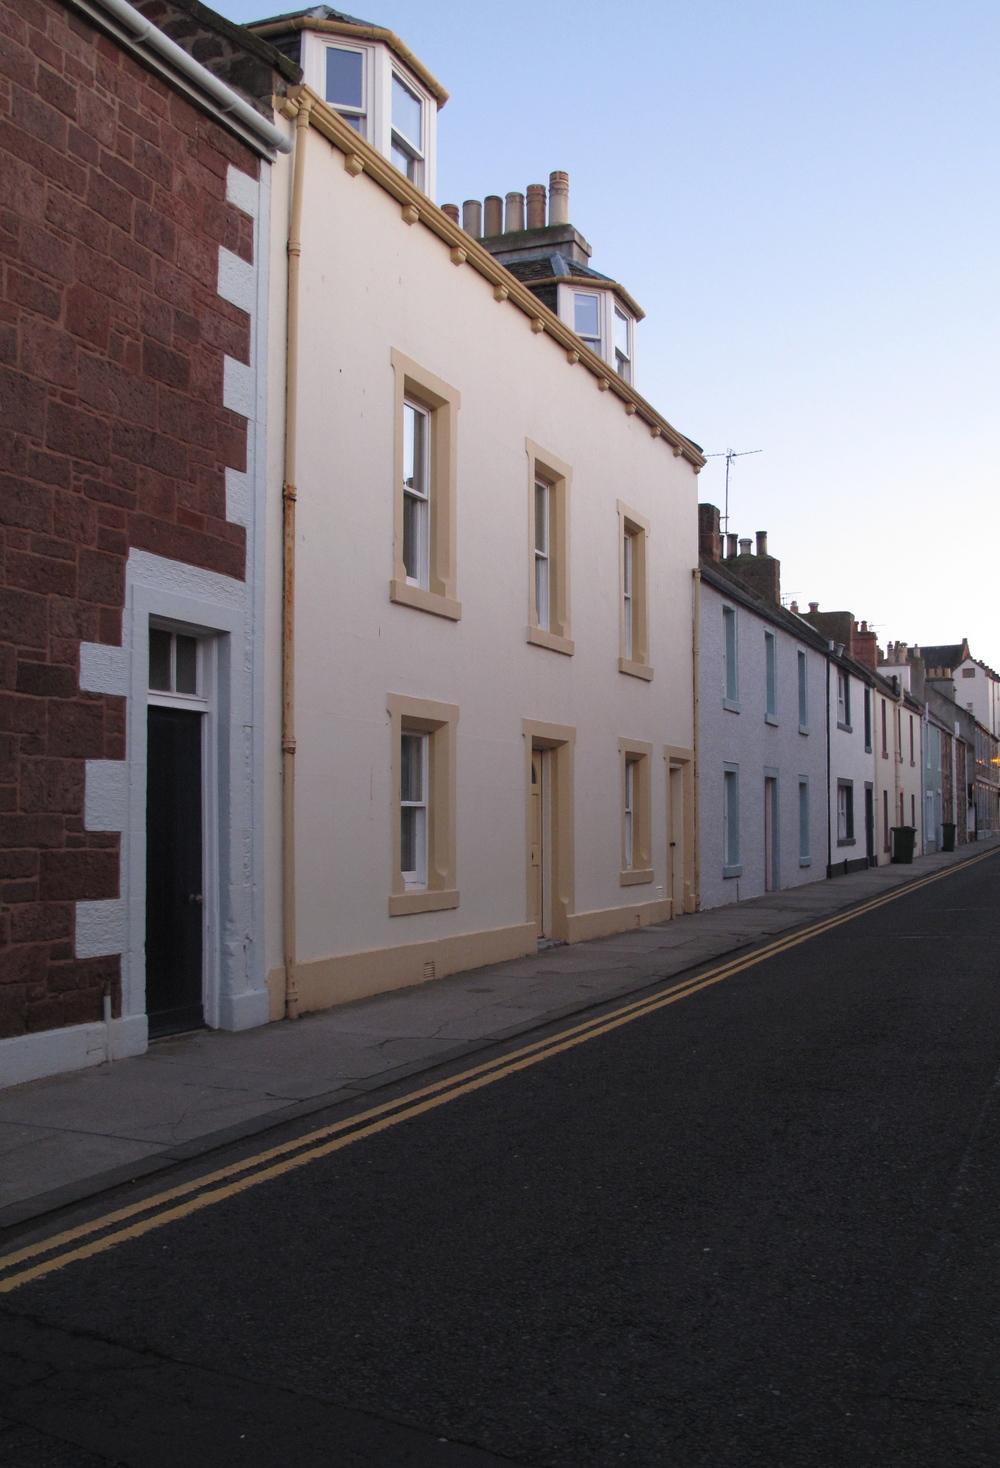 Coloured sea port houses in North Berwick